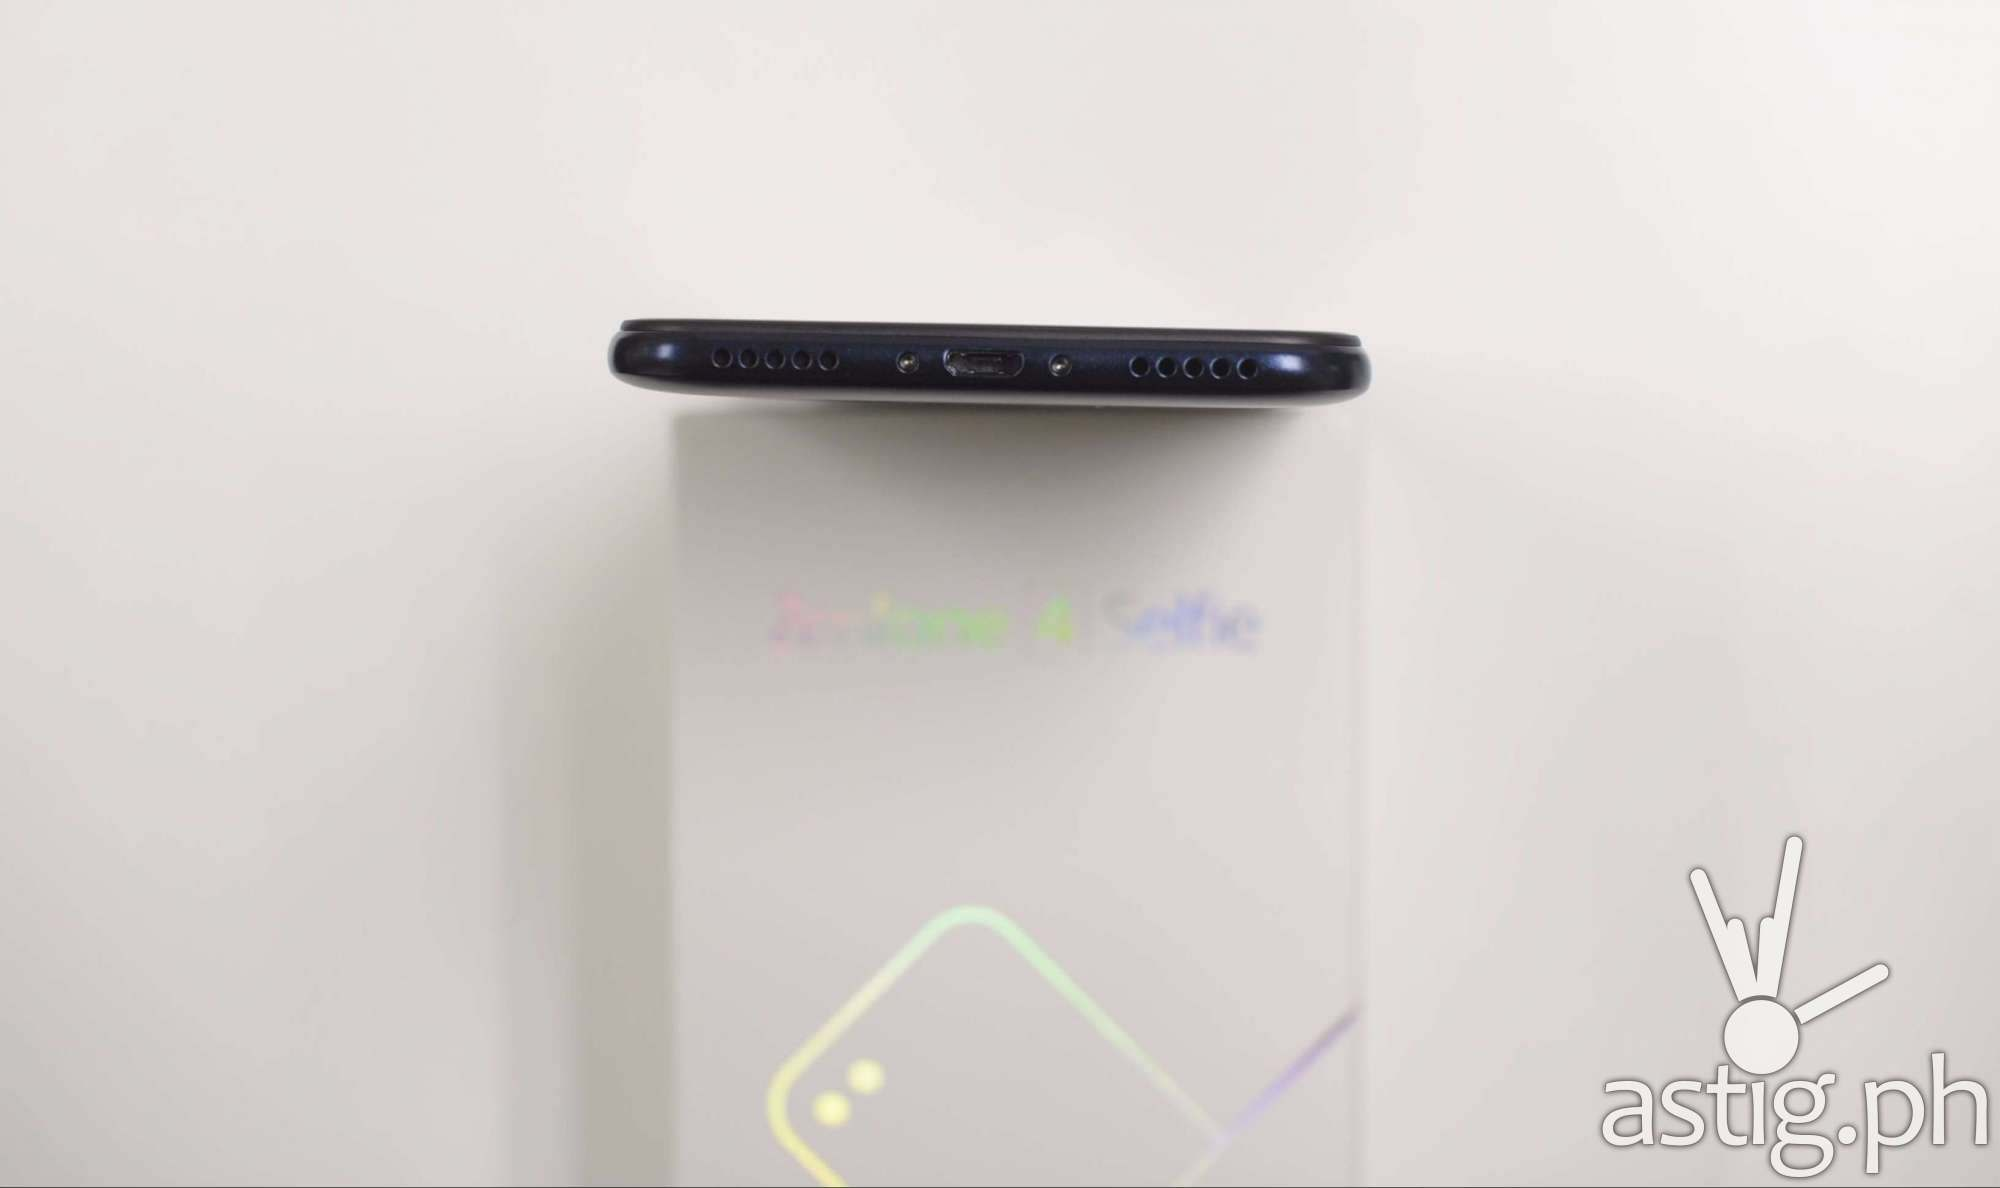 ASUS Zenfone 4 Selfie has dual speakers at the bottom